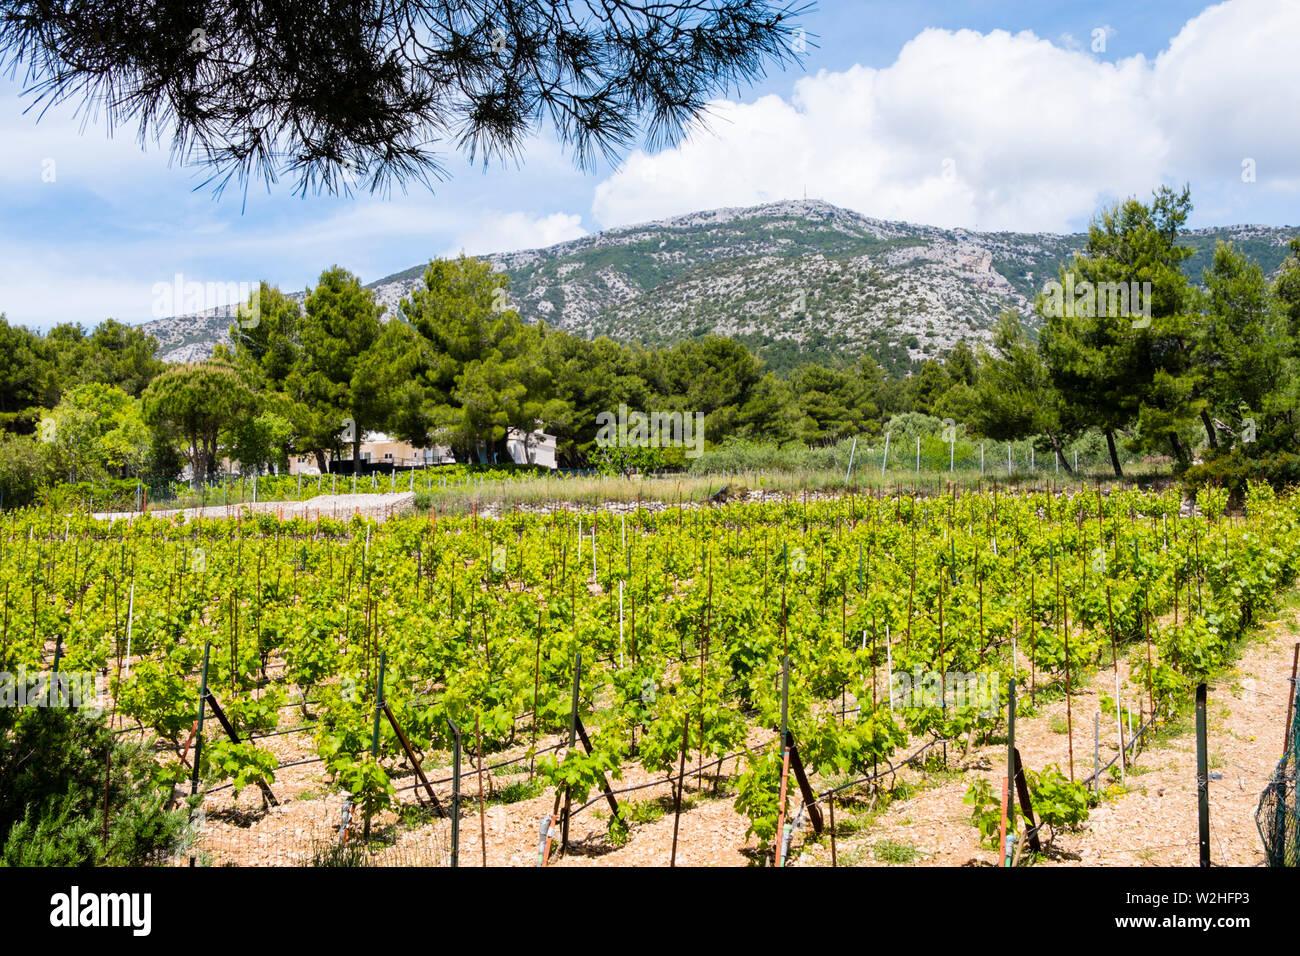 Vignes, Bol, Brac, Dalmatie, Croatie Photo Stock